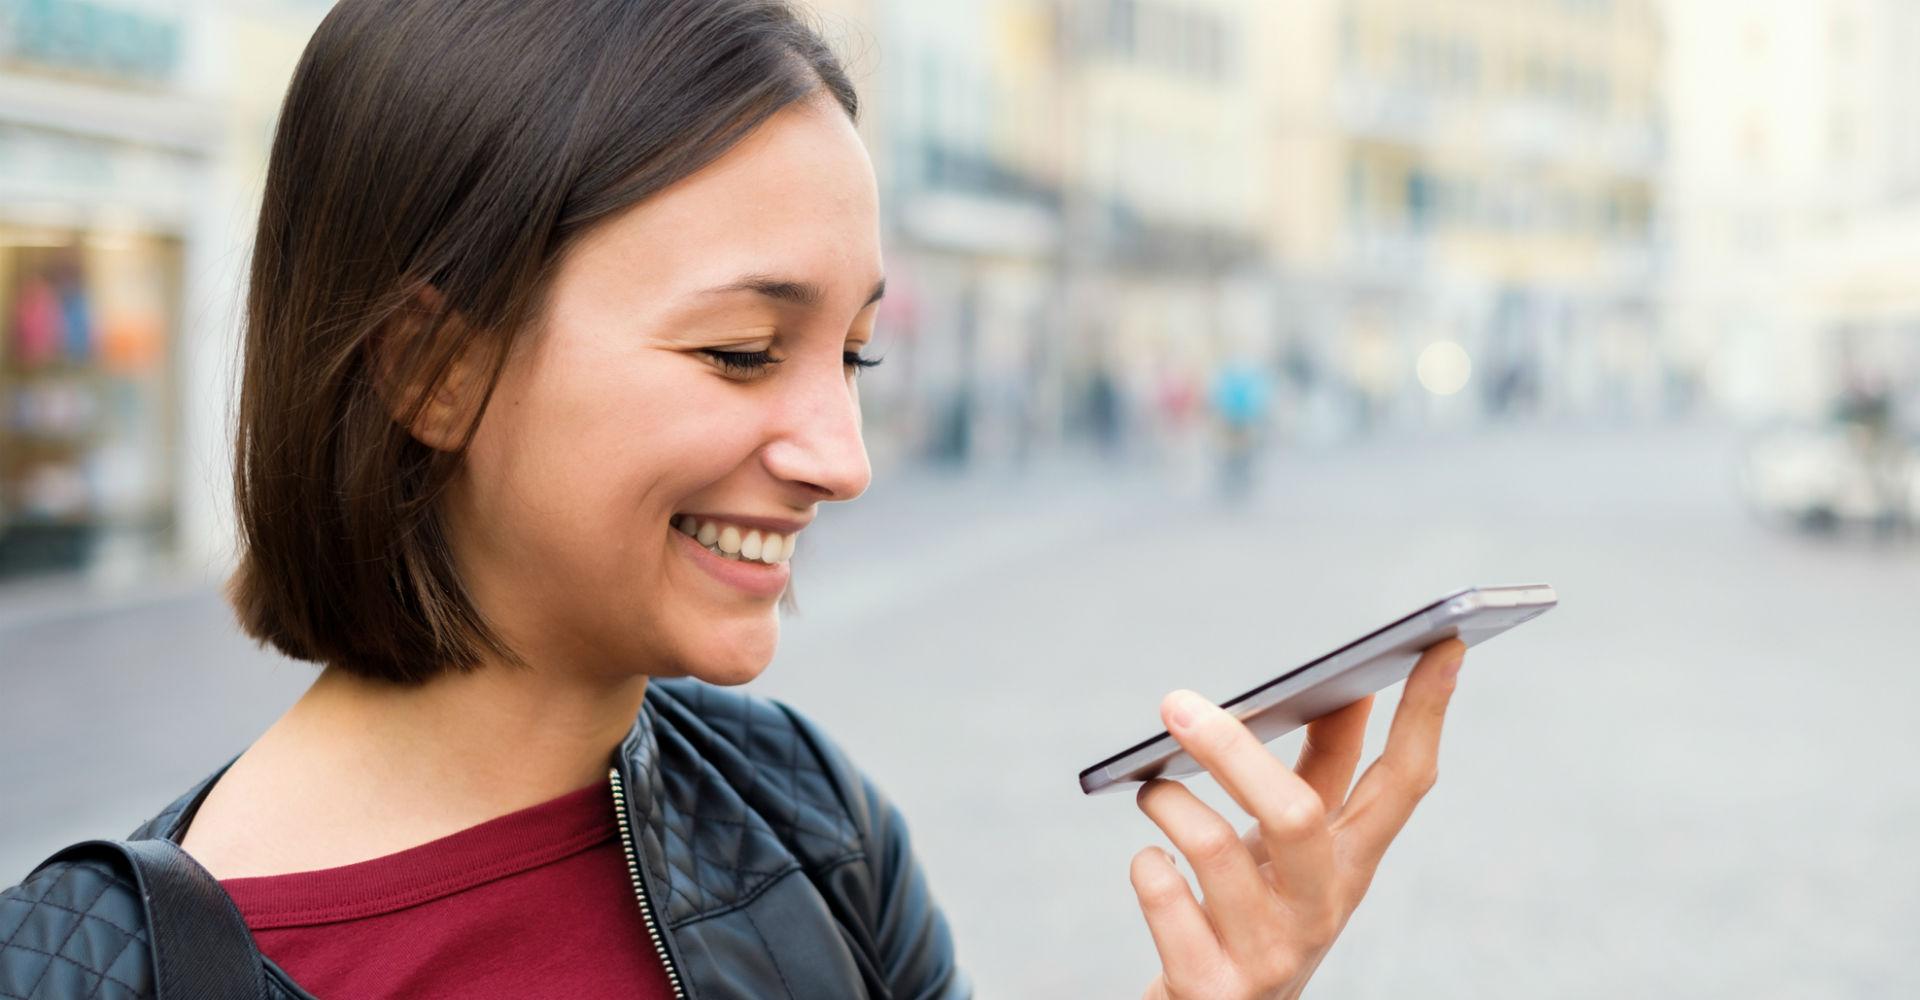 Samsung Galaxy: Bixby spricht jetzt offiziell Deutsch